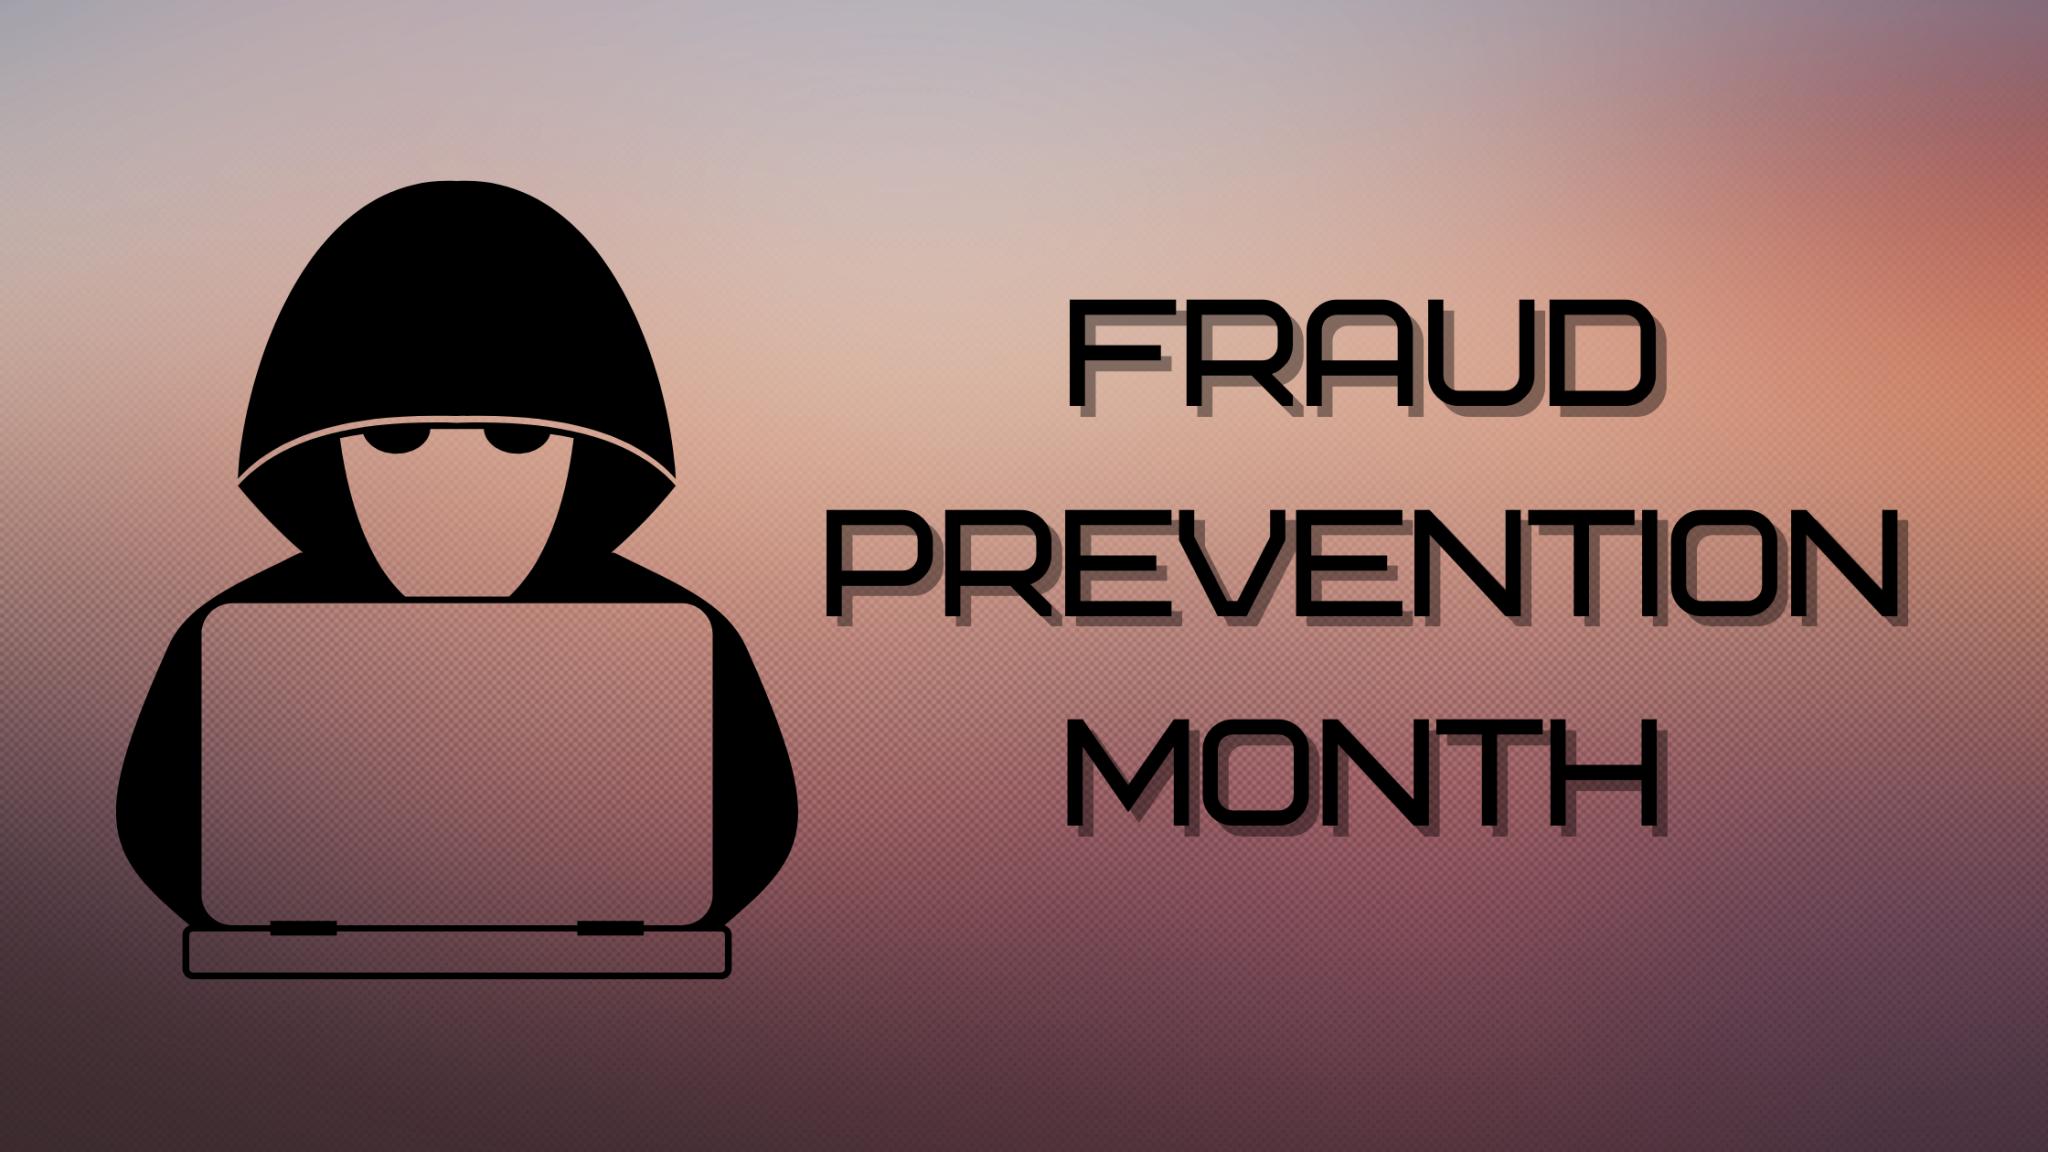 Fraud Prevention